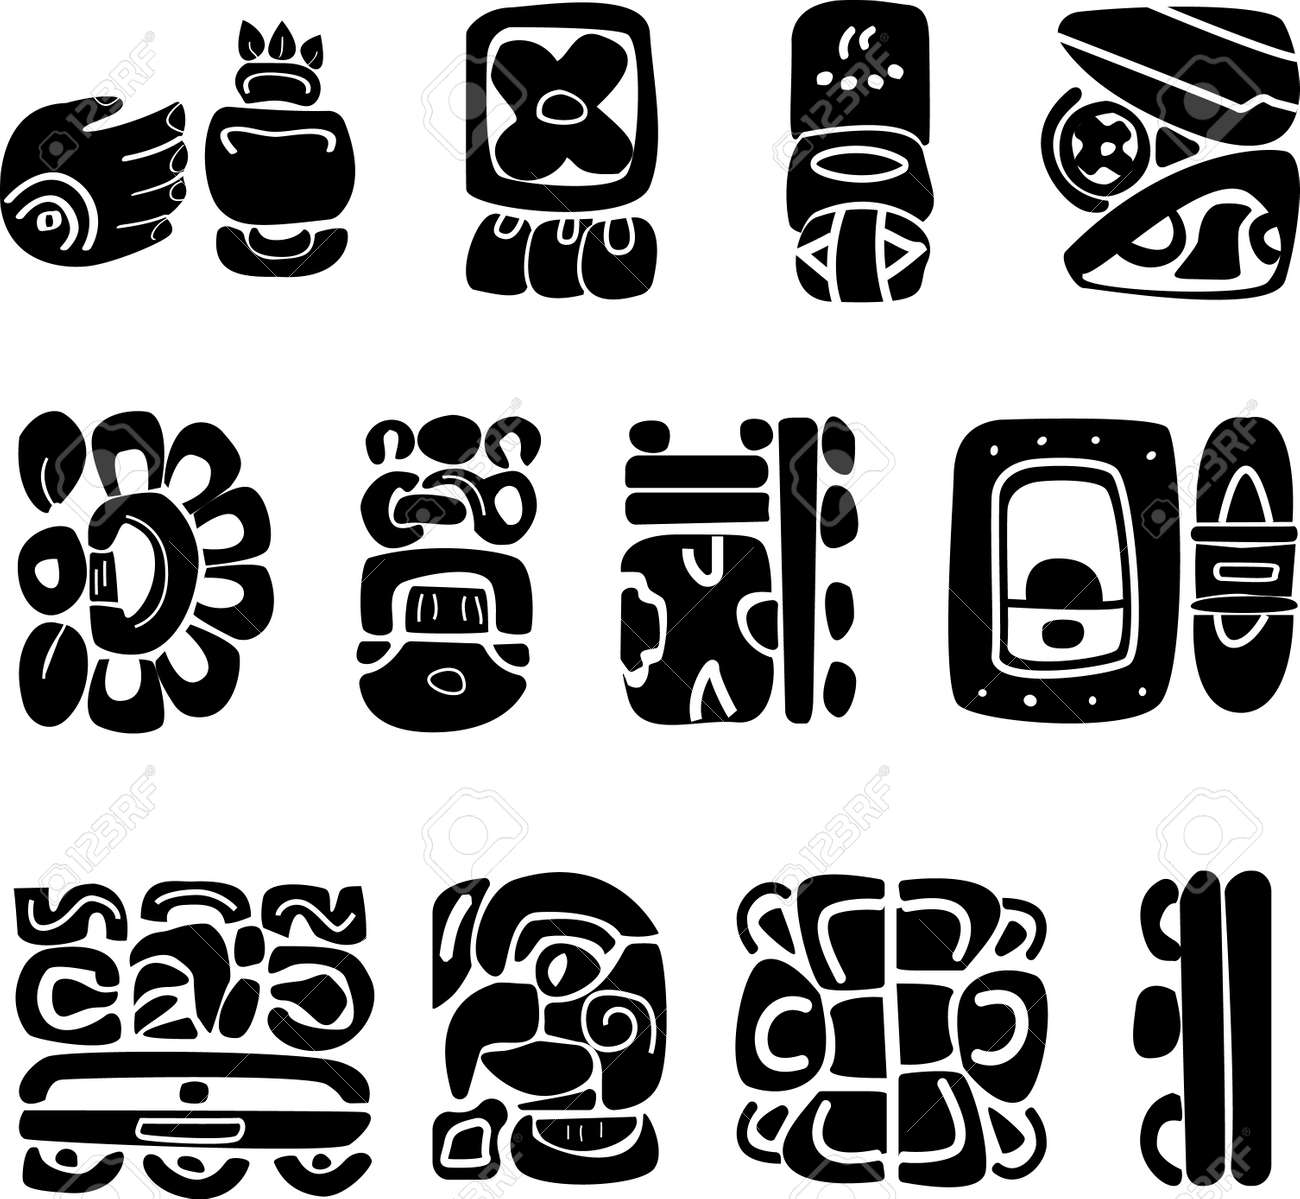 Symbols of the maya ethnic logos of southern america indian symbols of the maya ethnic logos of southern america indian drawings mexico logo stock buycottarizona Image collections